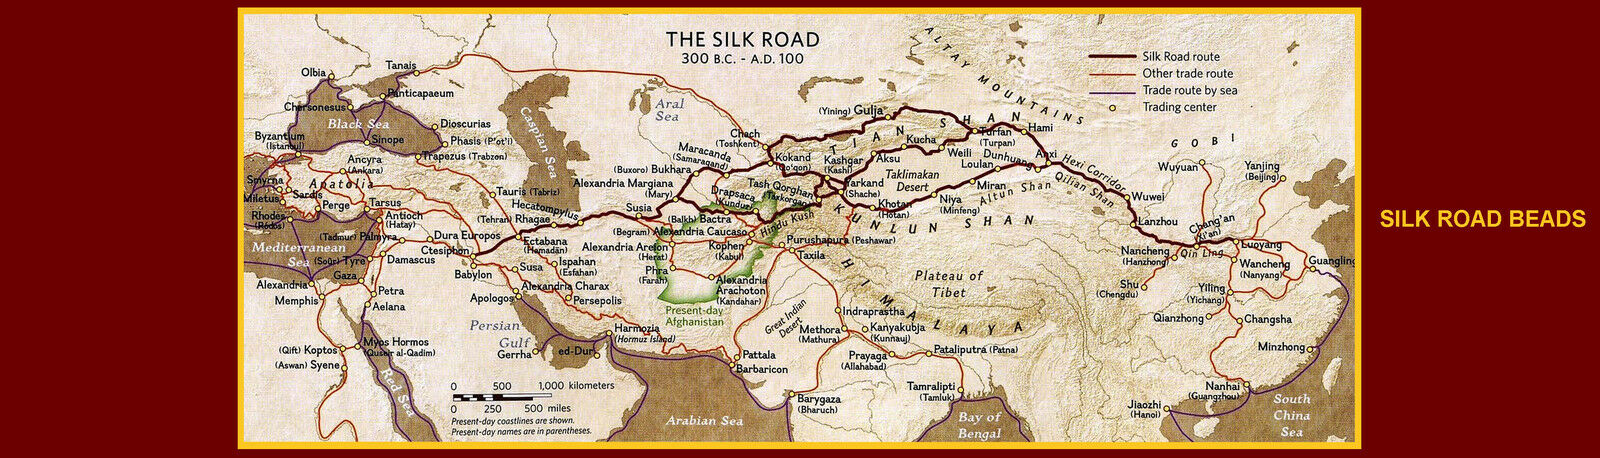 Silk Road Beads